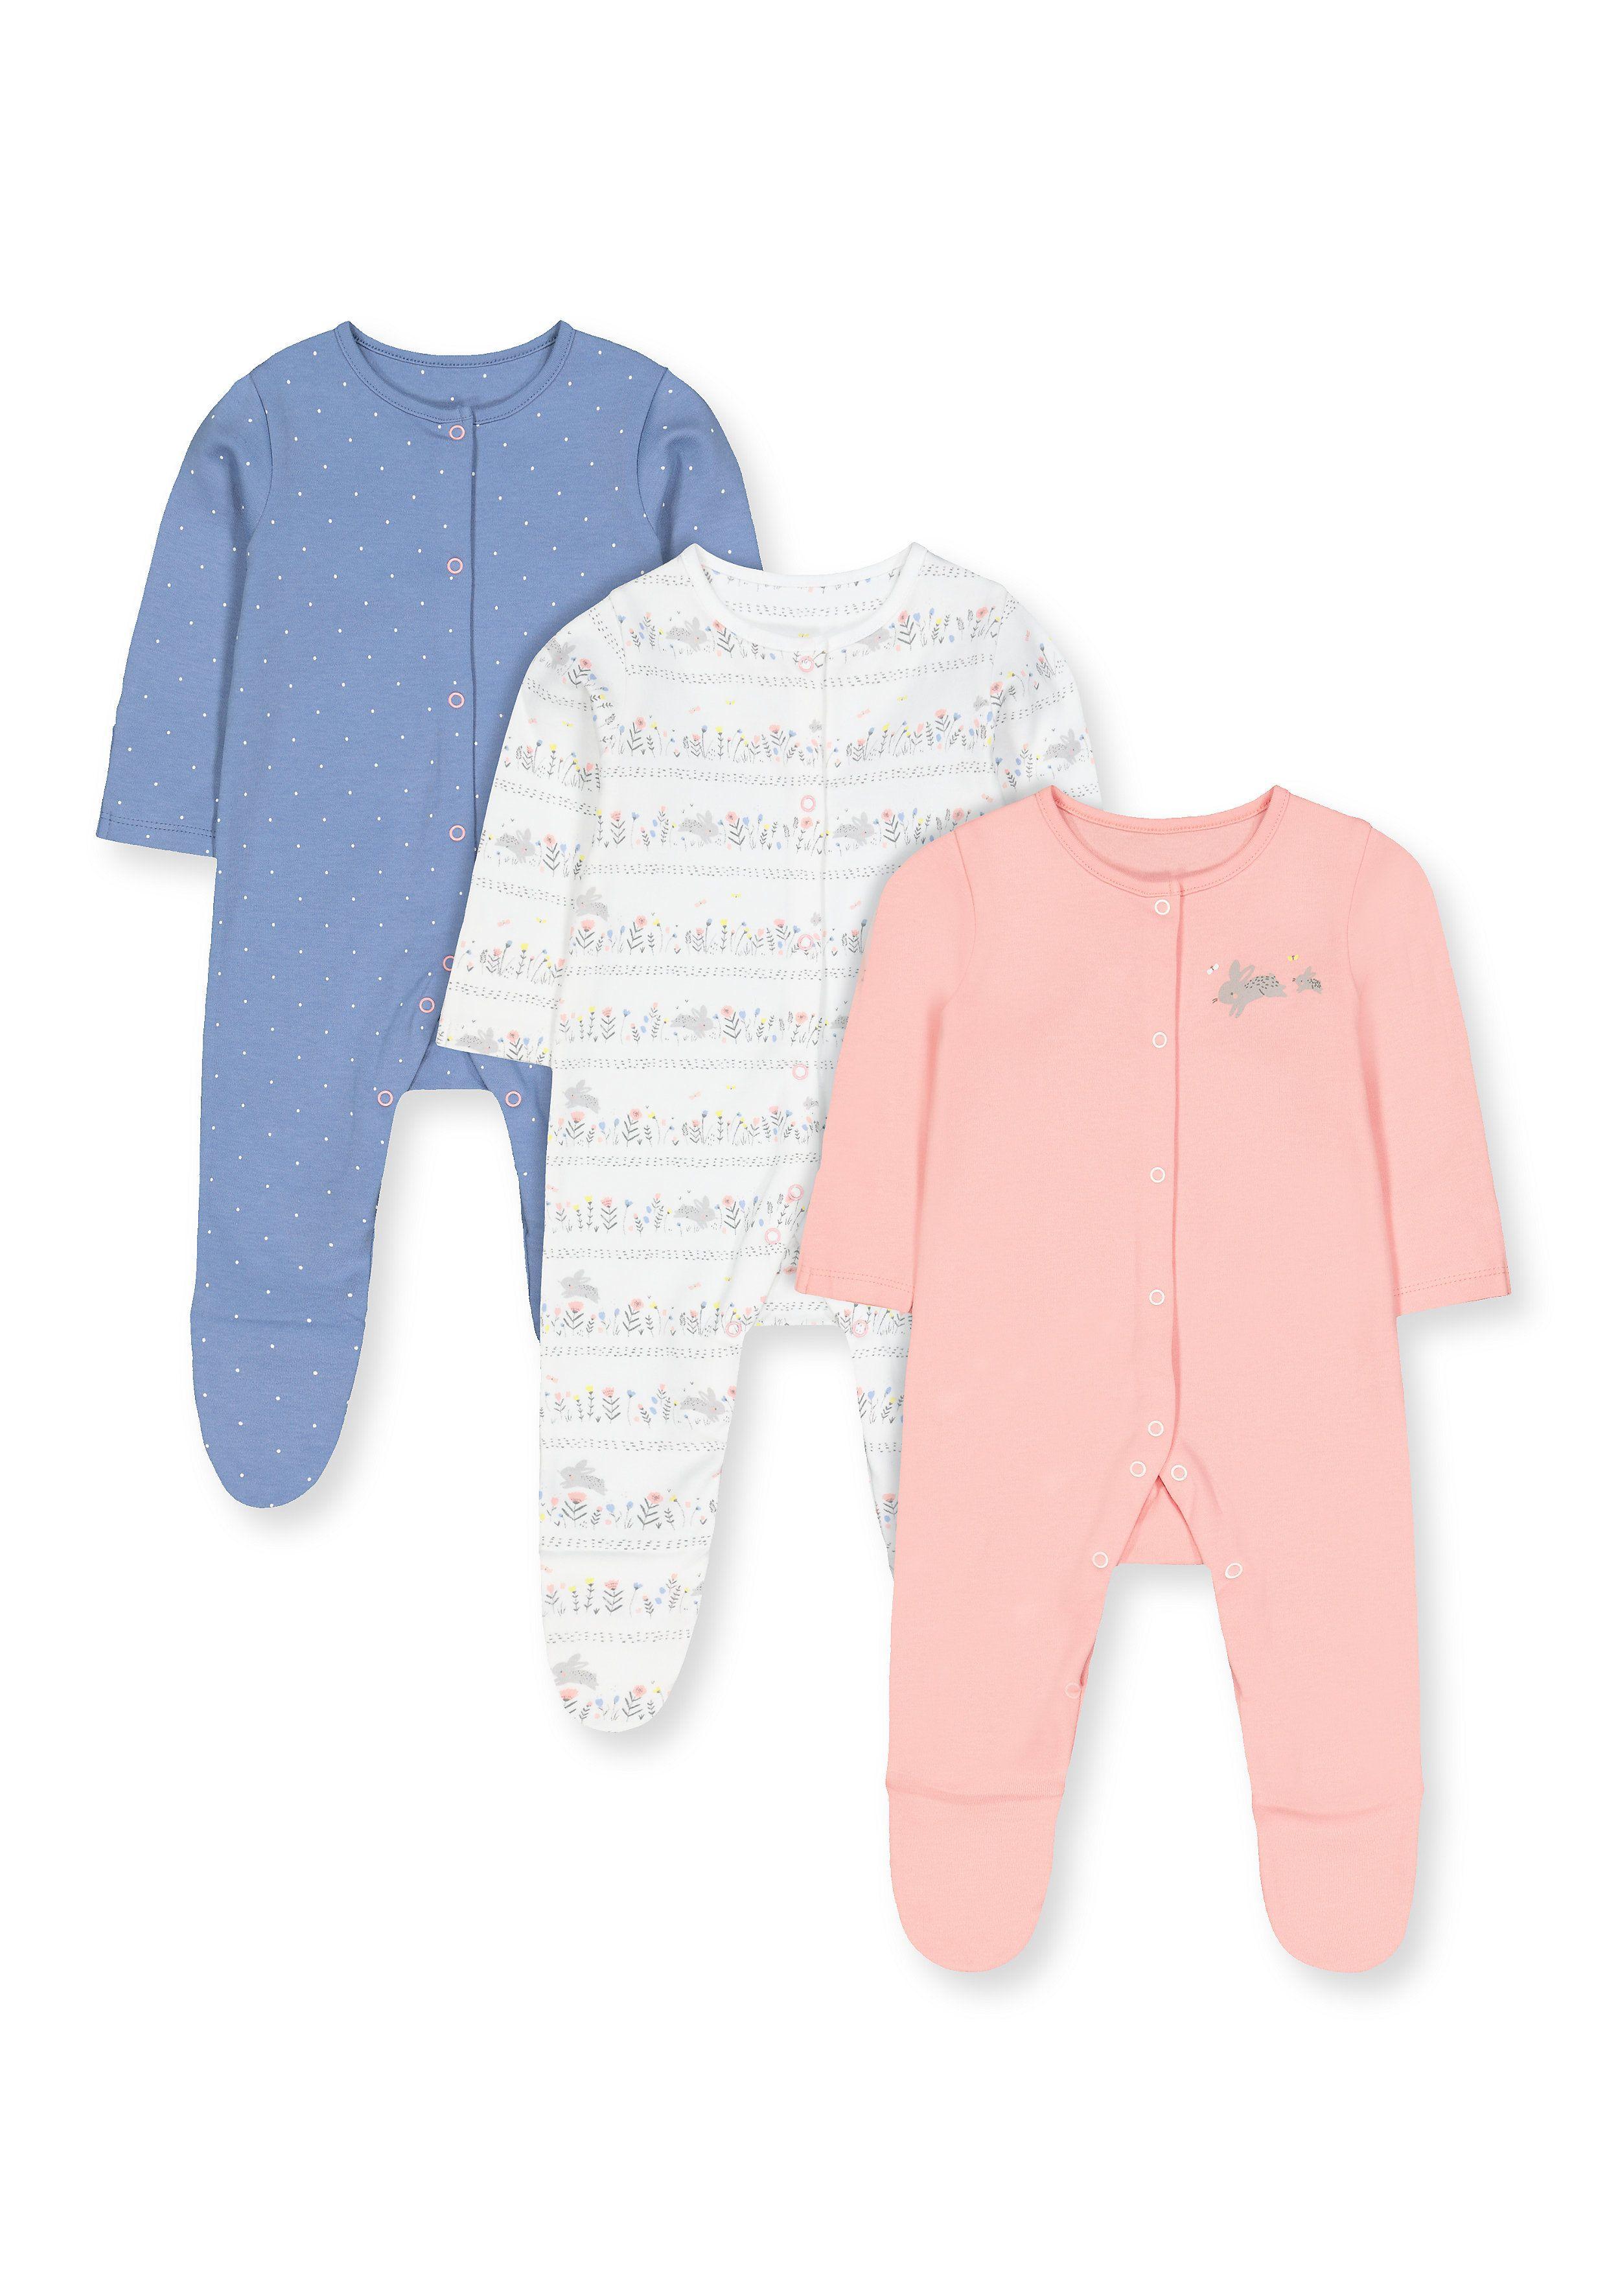 Mothercare | Multicoloured Printed Sleepwear Dresses (Pack of 3)